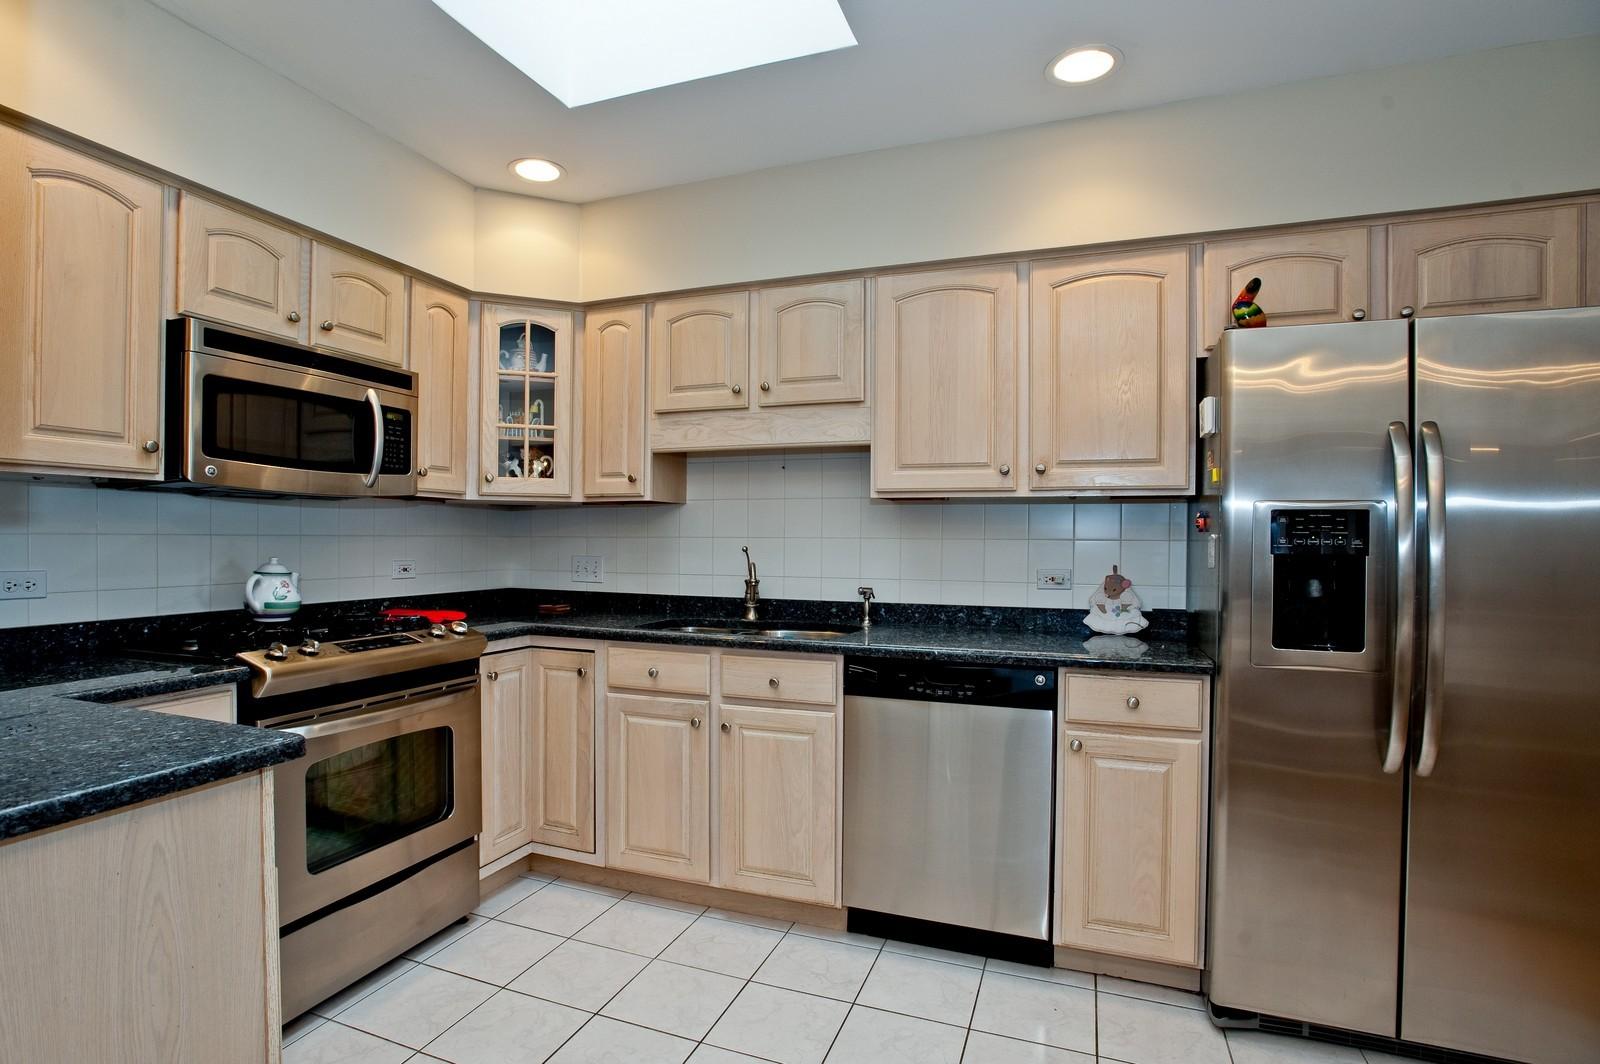 Real Estate Photography - 1700 2nd St, Highland Park, IL, 60035 - Kitchen